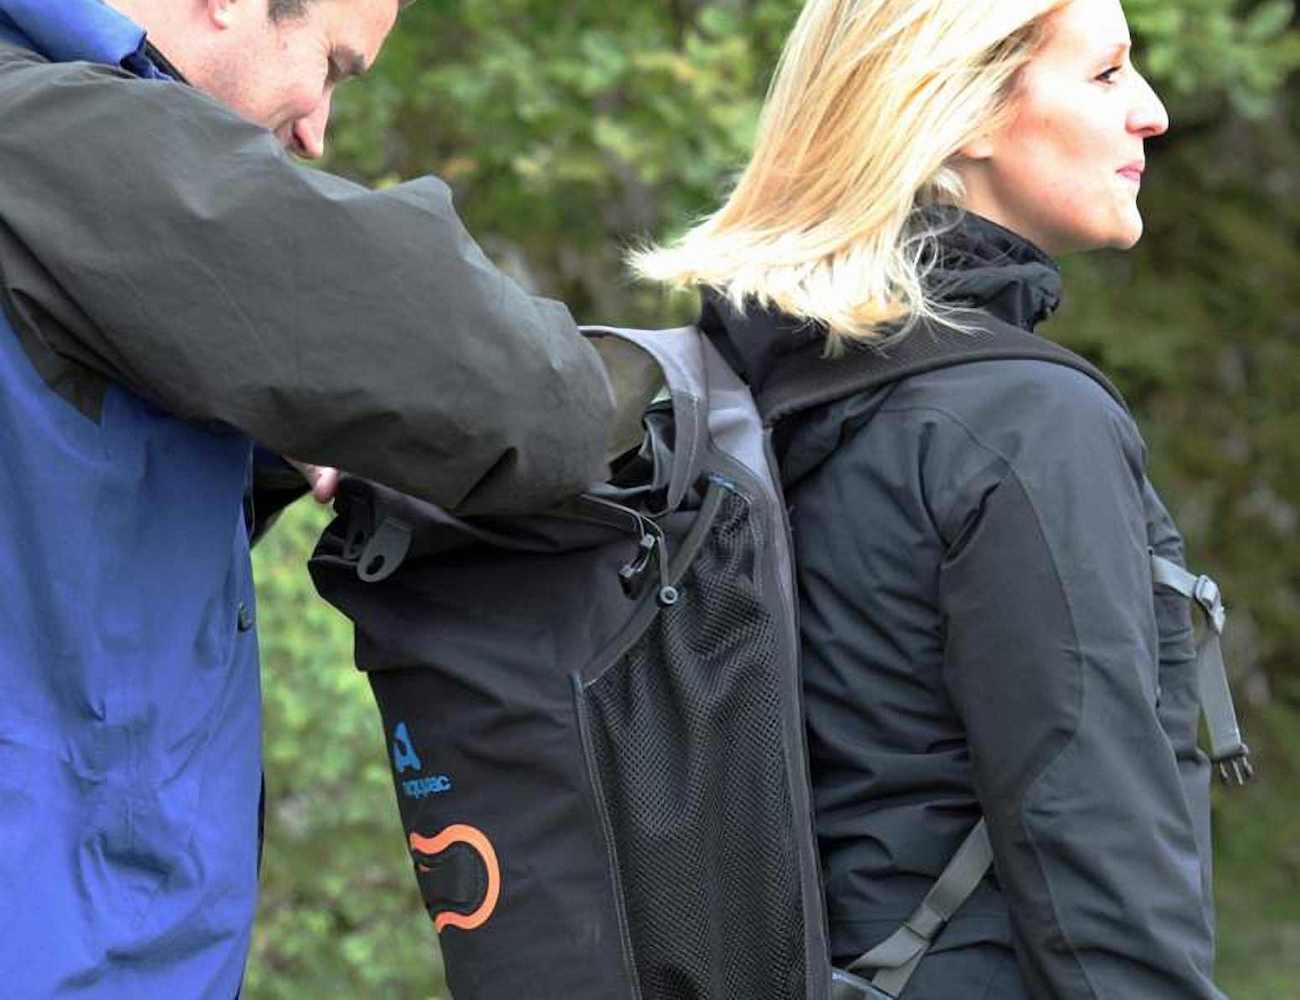 Aquapac 15L Wet & Dry Backpack